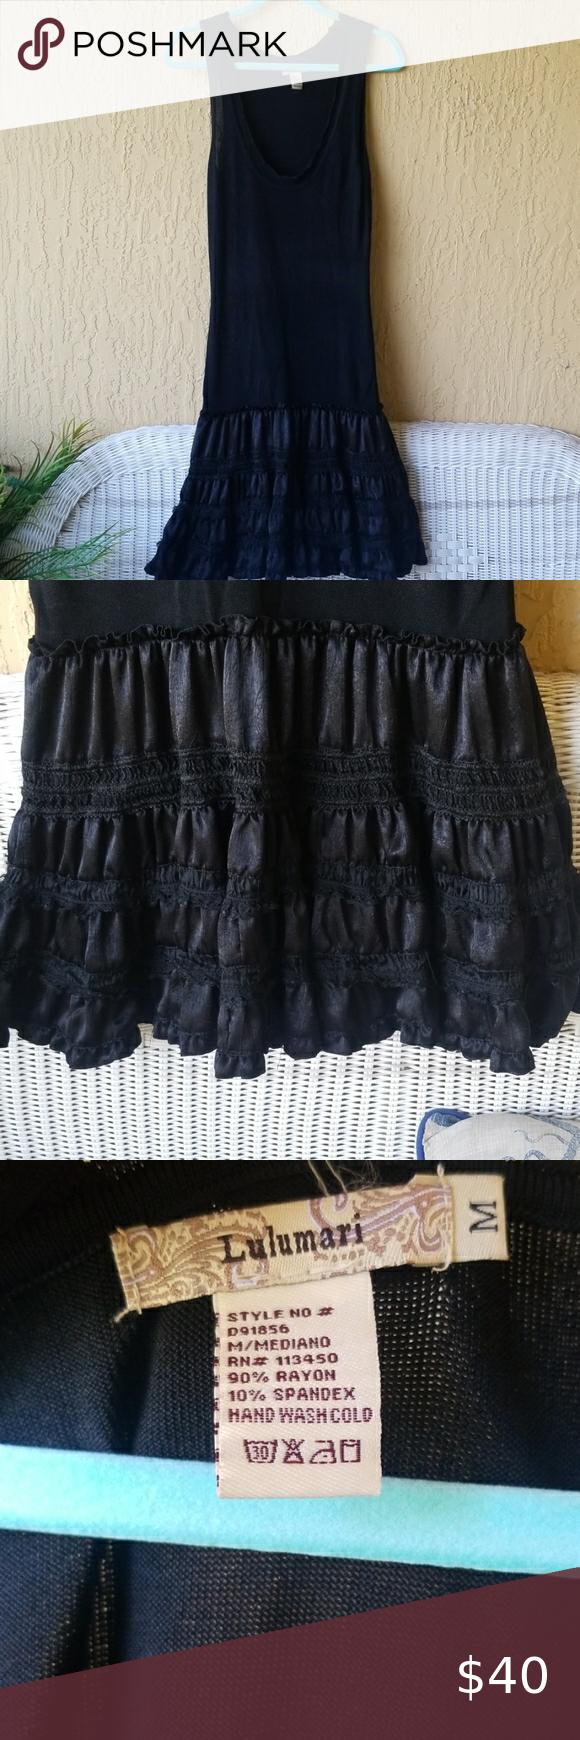 Black Dress With Ruffle Bottom Sz M Clothes Design Black Dress Dresses [ 1740 x 580 Pixel ]